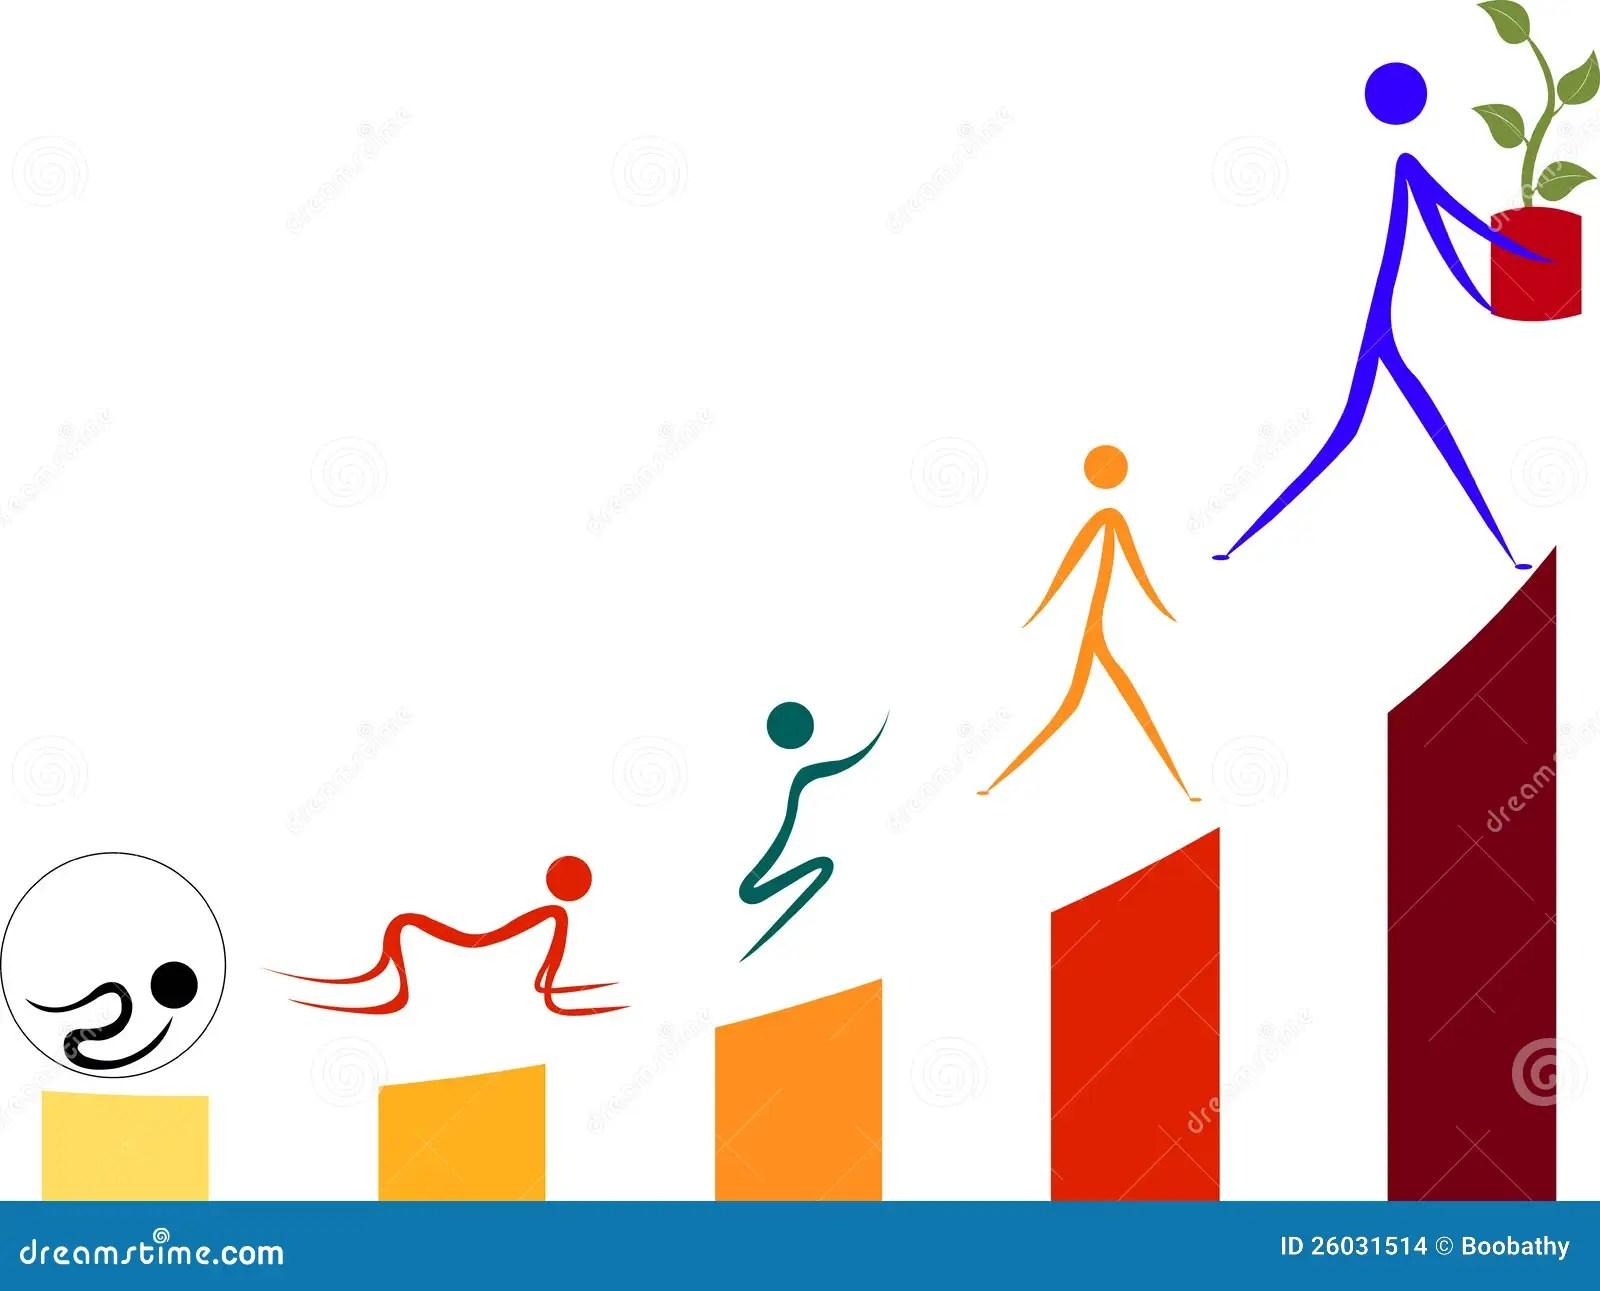 Generation Growth Stock Illustration Illustration Of